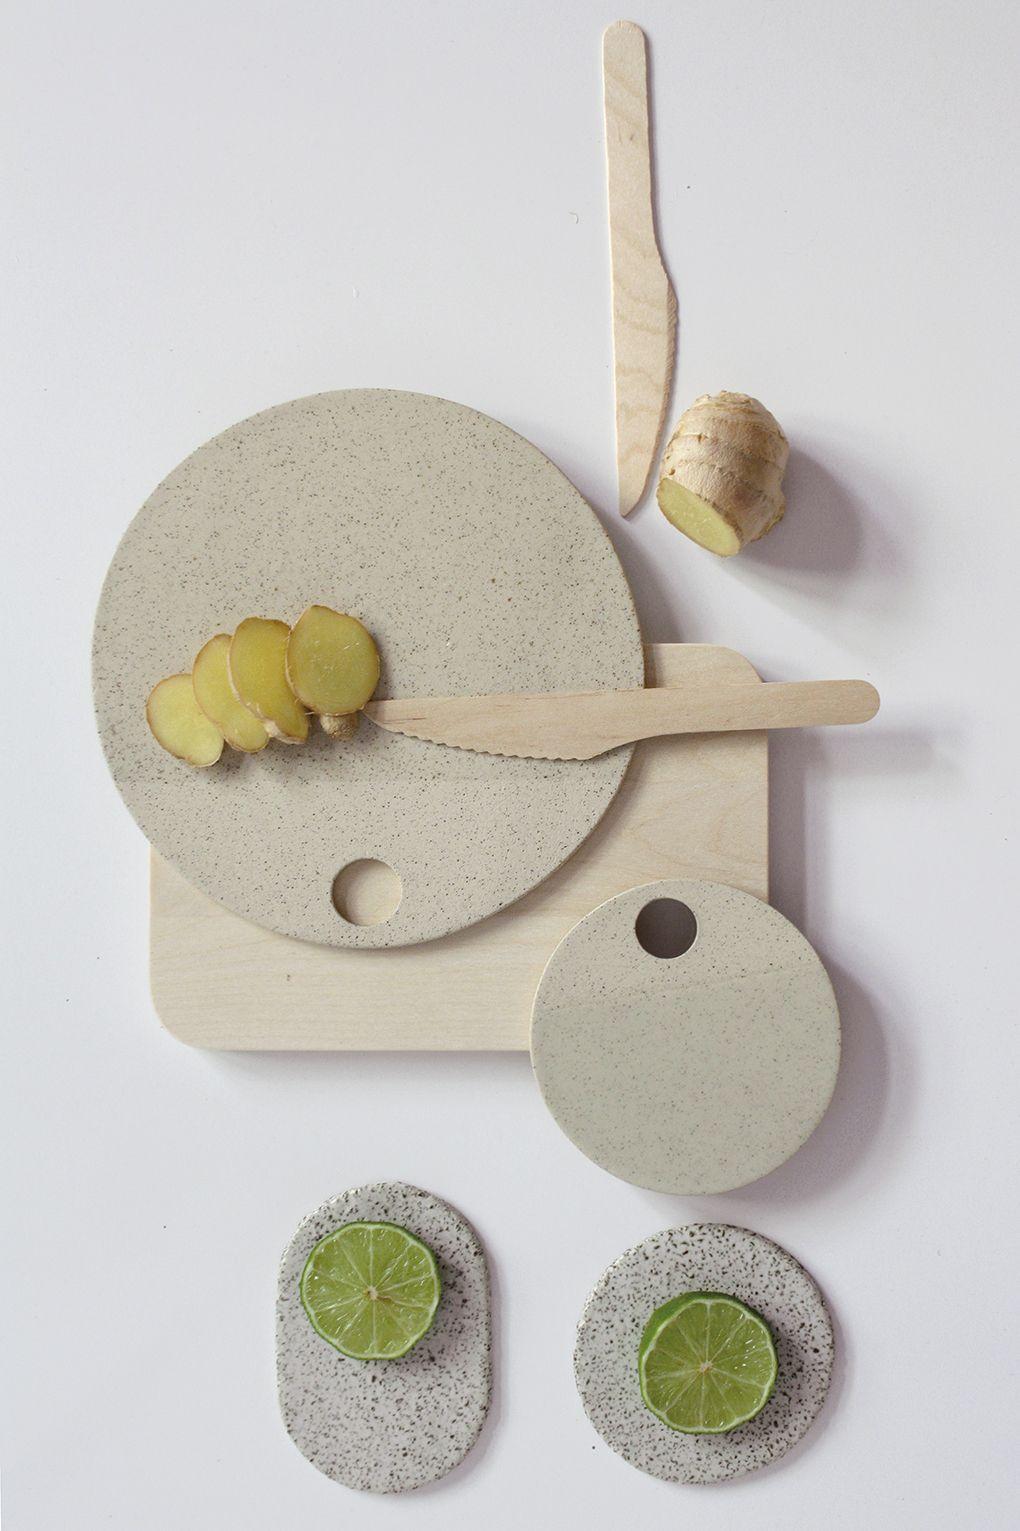 // Handmade with speckled stoneware. // Transparent glossy on upper part. Unglazed on the back. #ceramics #handmadeceramics #tray #serving #tableware #housewares #clay #design #ceramicdesign #pottery #philokceramics